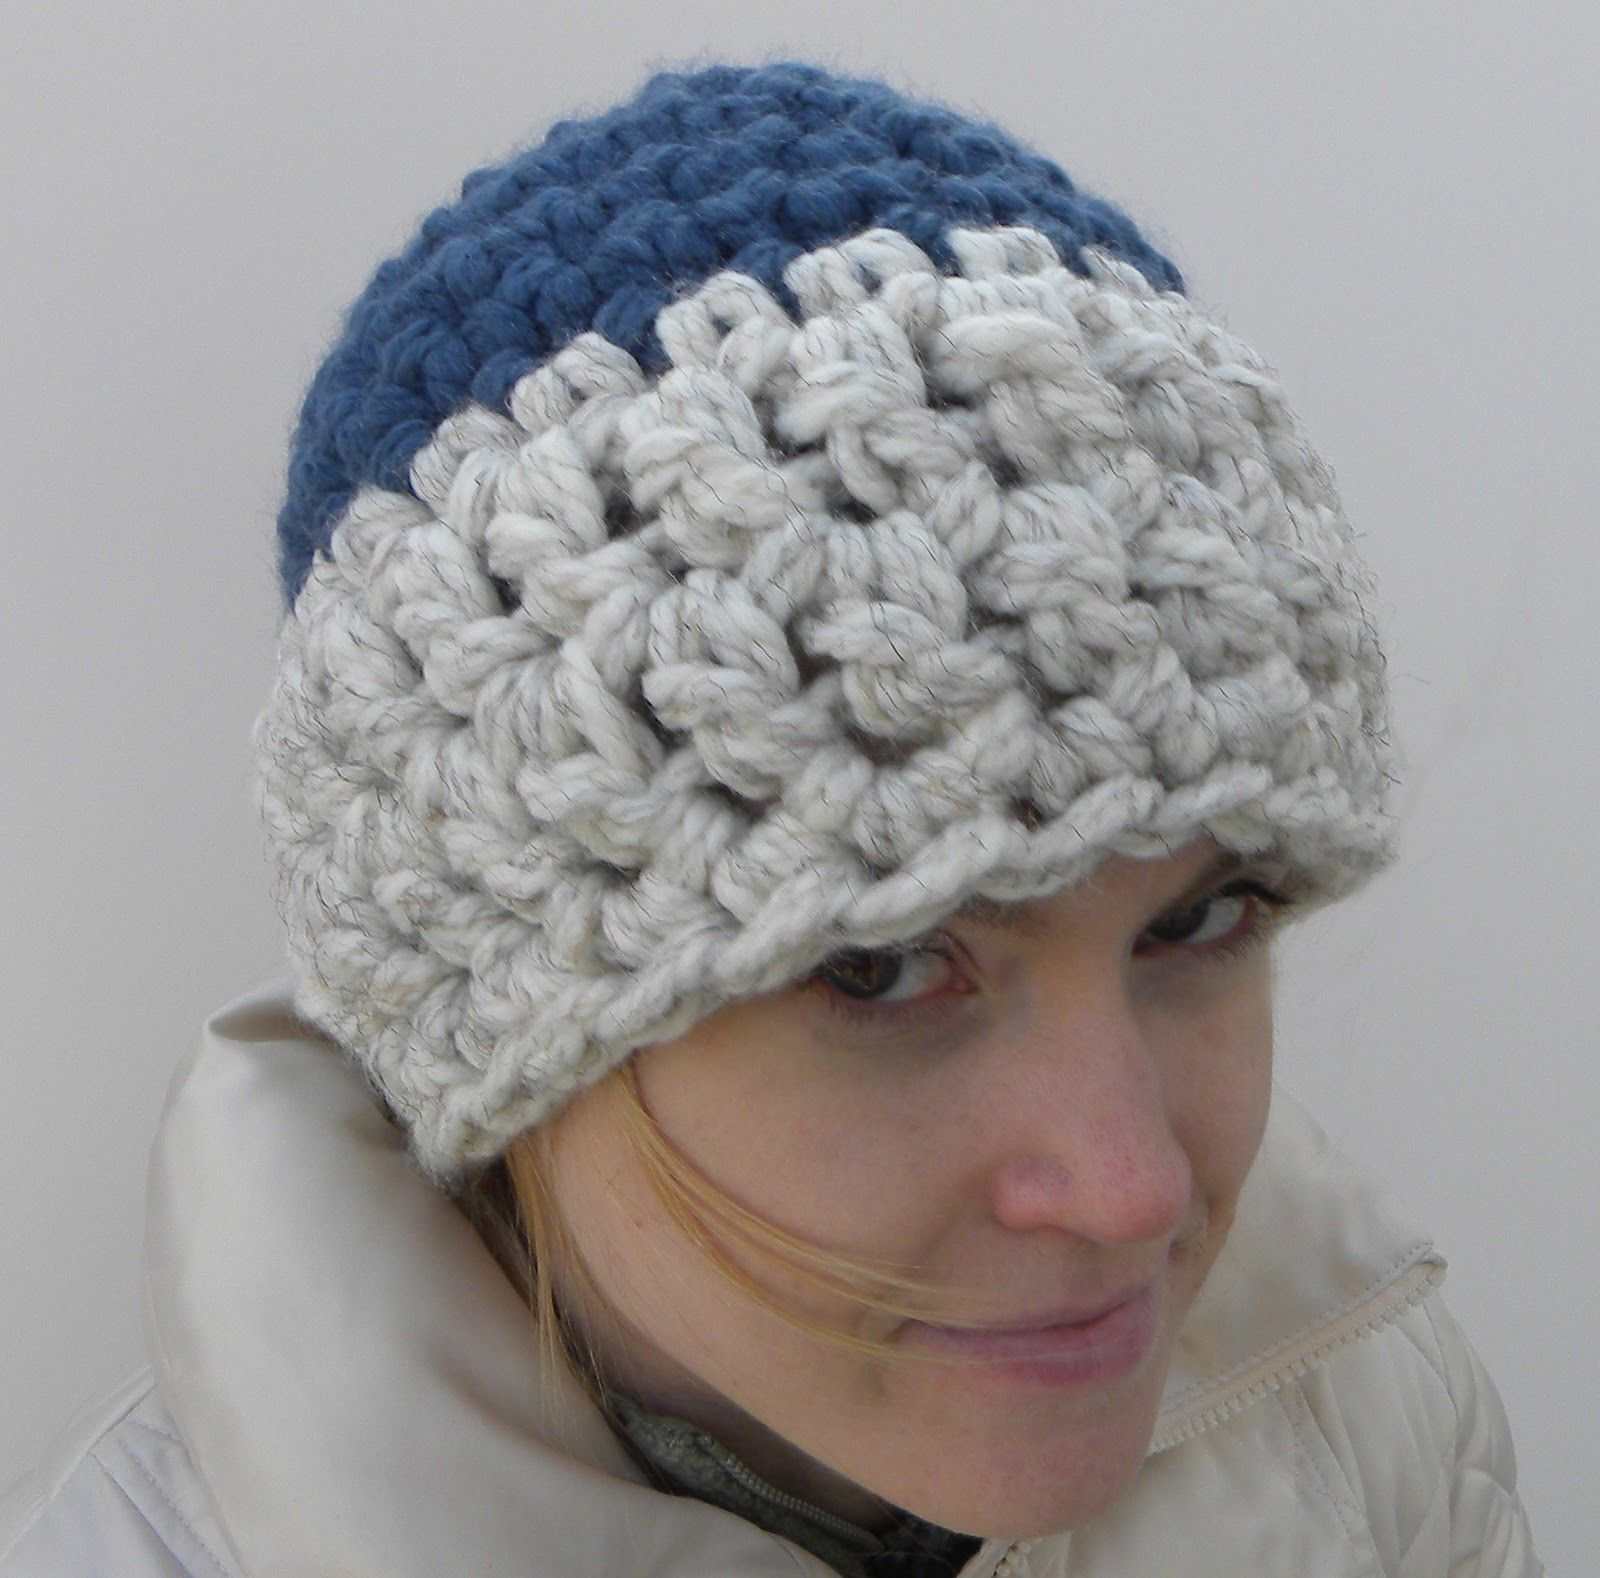 Crochet beanie hat using 2 strands of super bulky yarn crochet crochet beanie hat using 2 strands of super bulky yarn bankloansurffo Choice Image